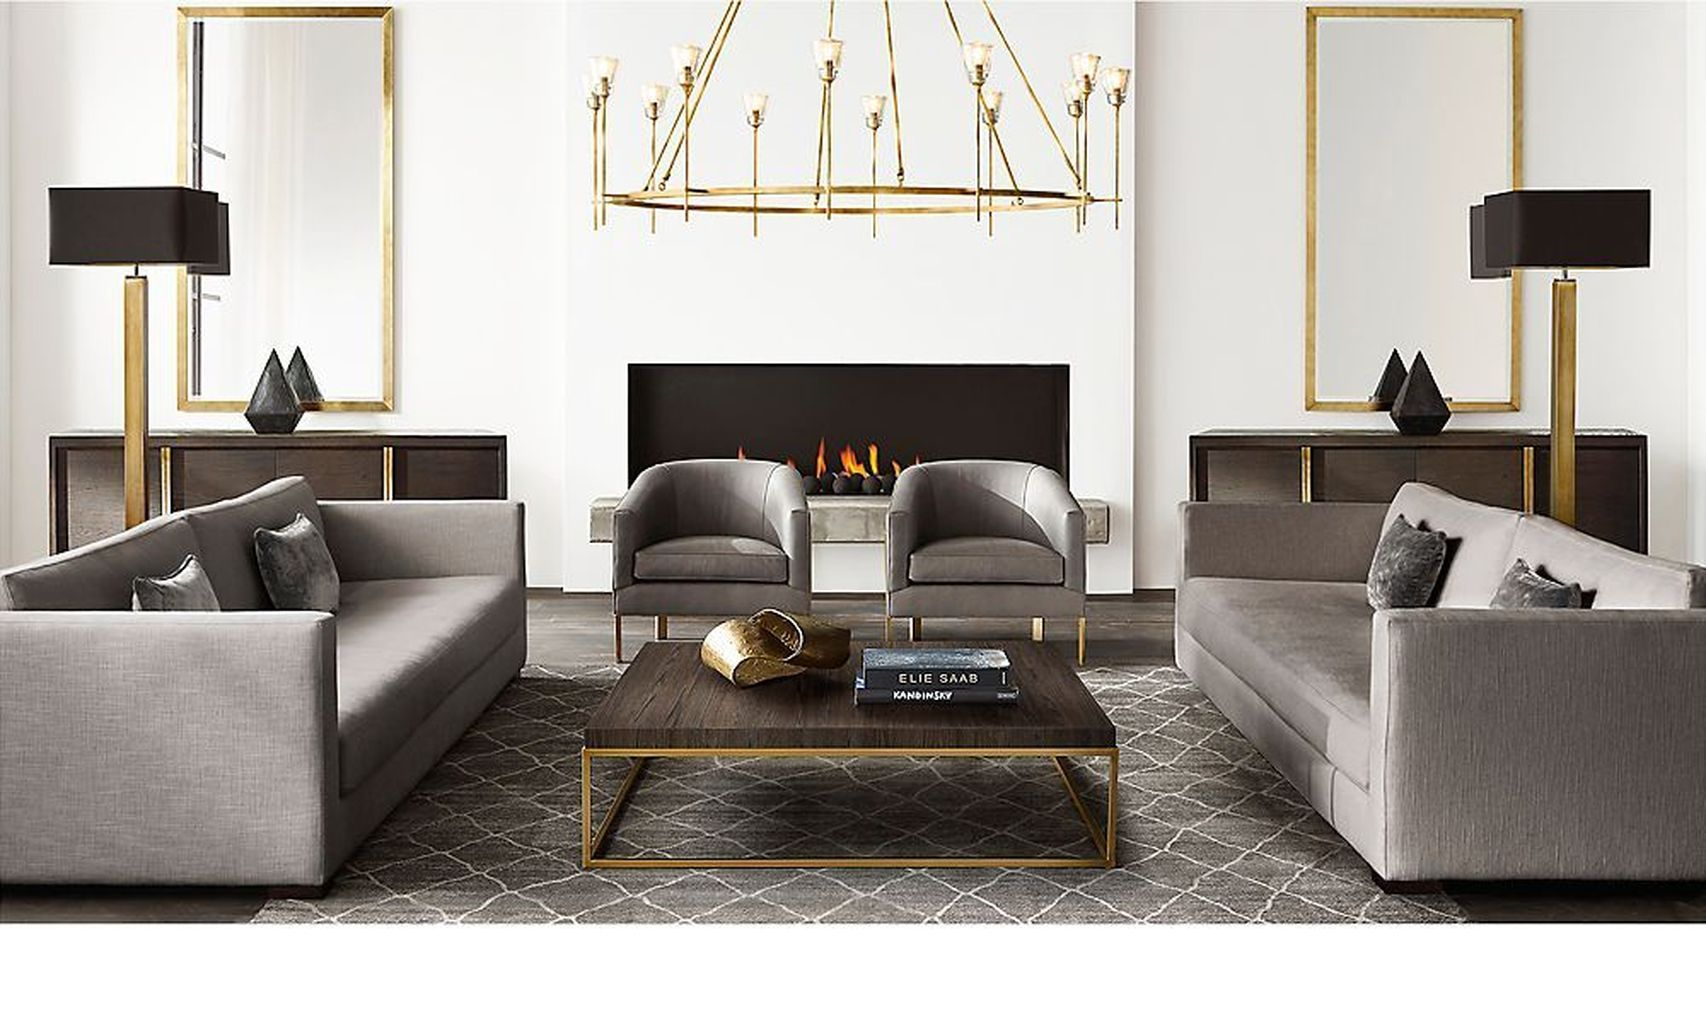 99 Modern Living Room Color Schemes Decor Ideas Decorisart Restoration Hardware Living Room Modern Living Room Colors Living Decor [ 1024 x 1706 Pixel ]